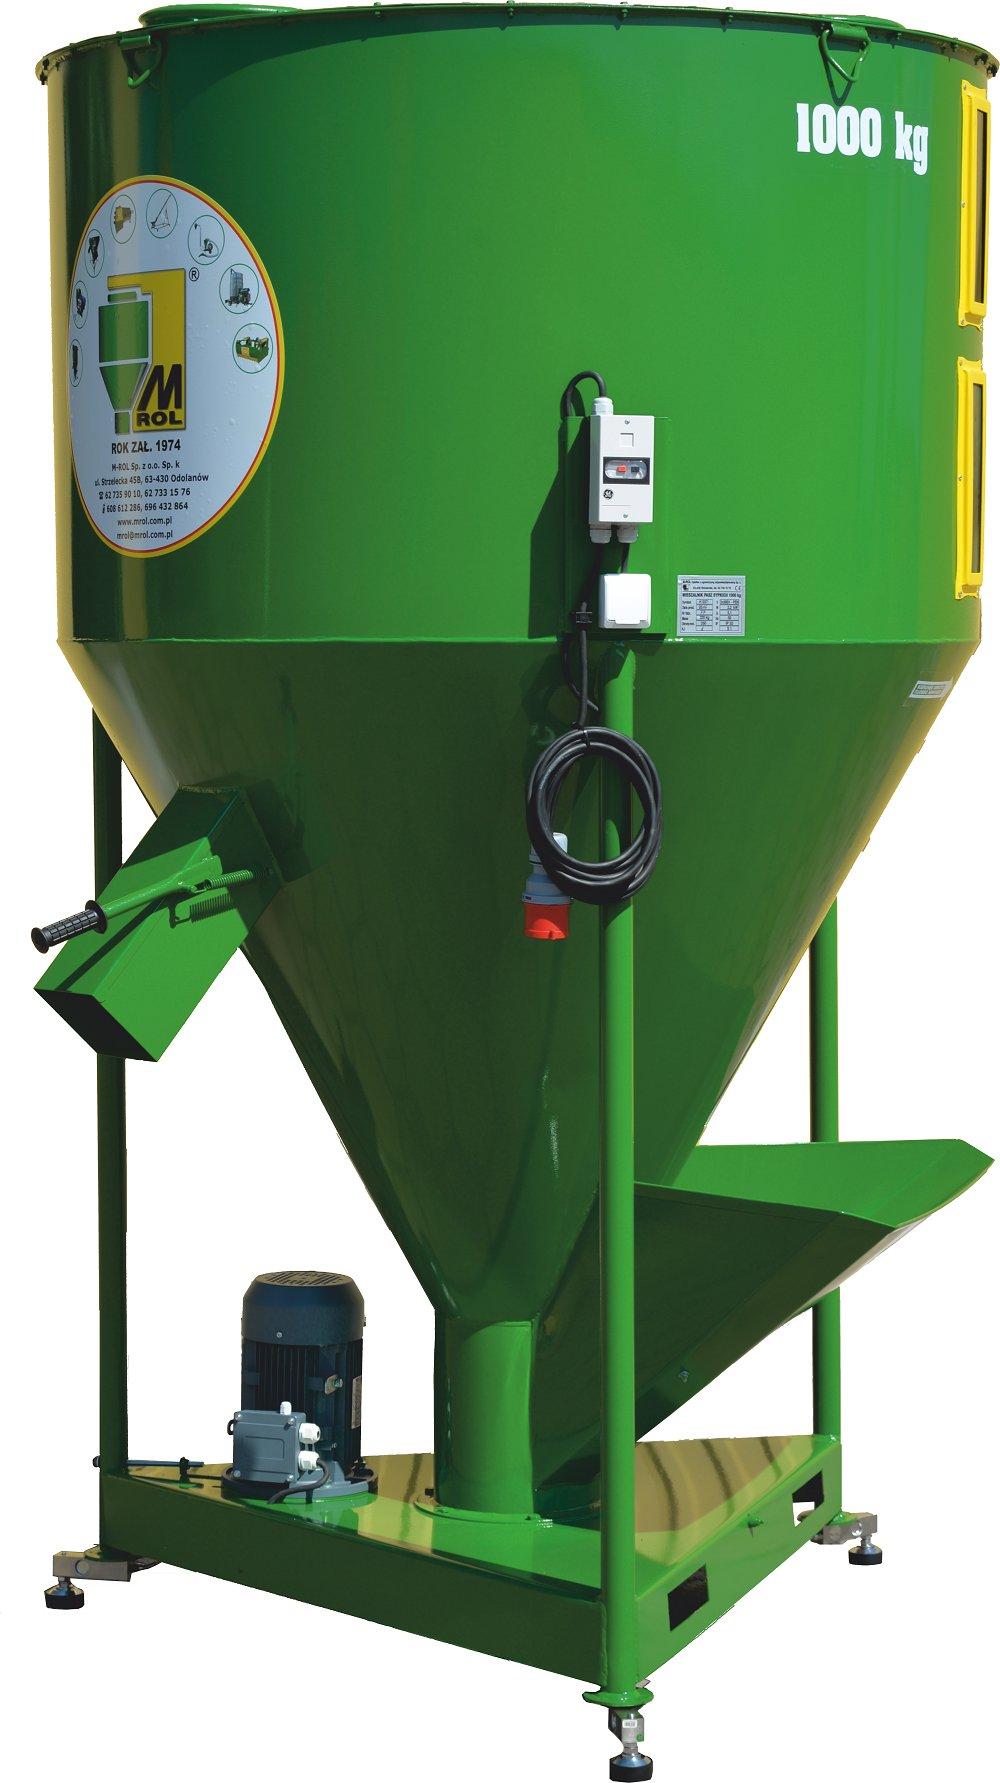 Mixér krmiva kŕmenie 500 kg výrobcu hit! M-rola